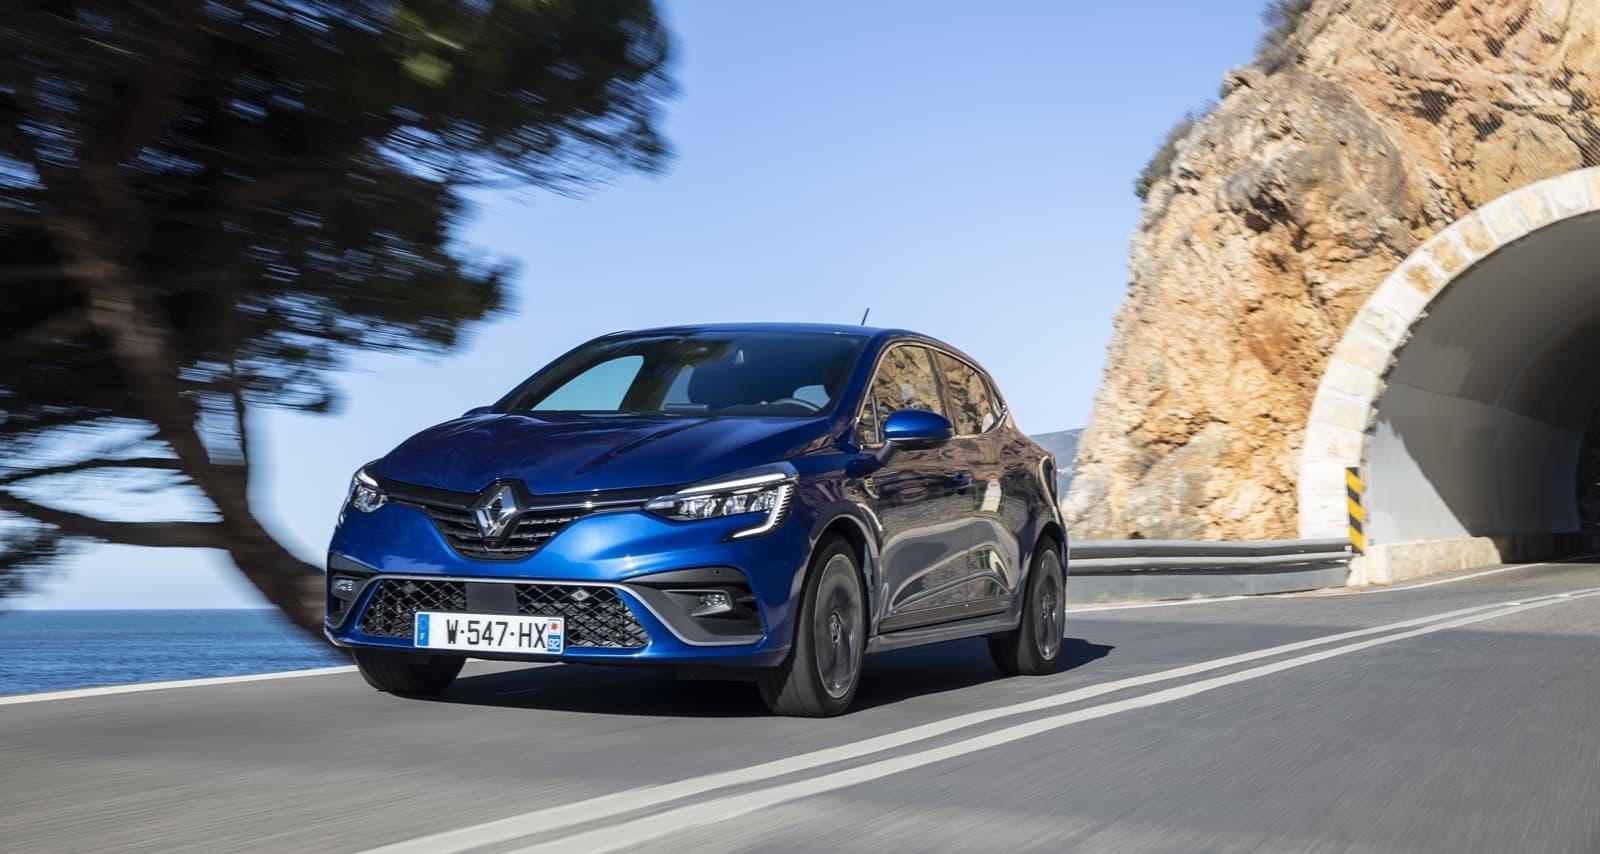 Renault Clio 2020 Prueba 0619 024